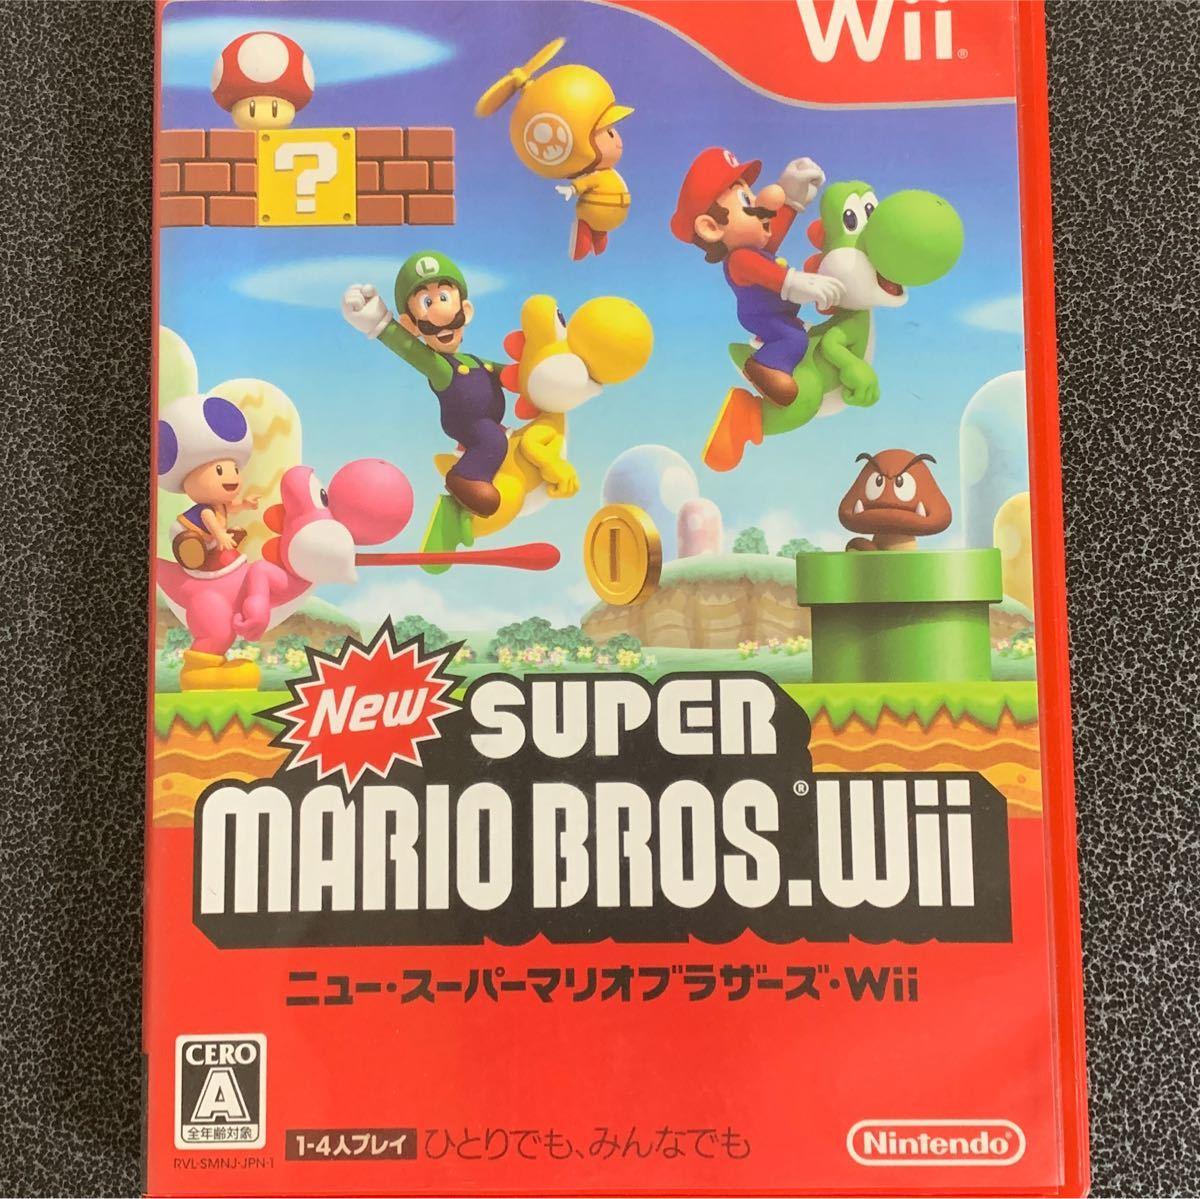 Wiiソフト NewスーパーマリオブラザーズWii ニュースーパー マリオブラザーズSUPER MARIO BROS.任天堂Wii